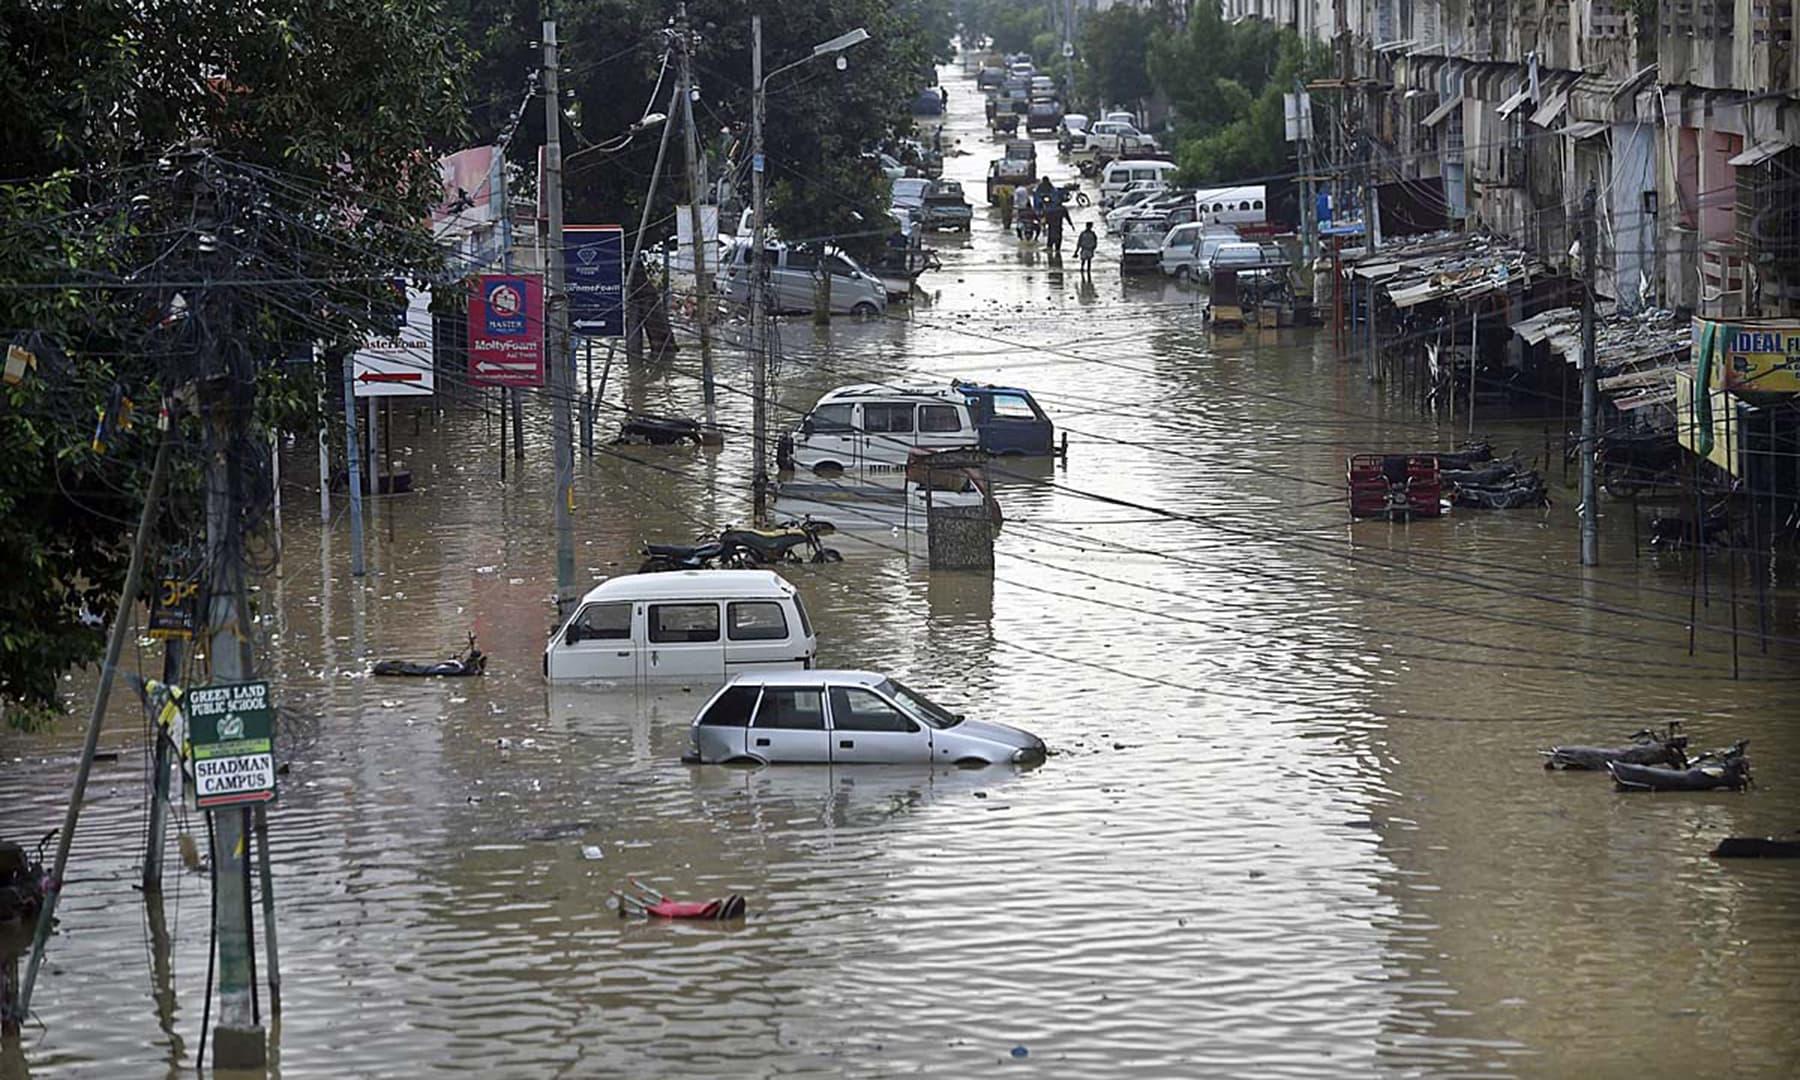 A view of a flooded street at Nagan Chowrangi after heavy monsoon rain in Karachi. — APP